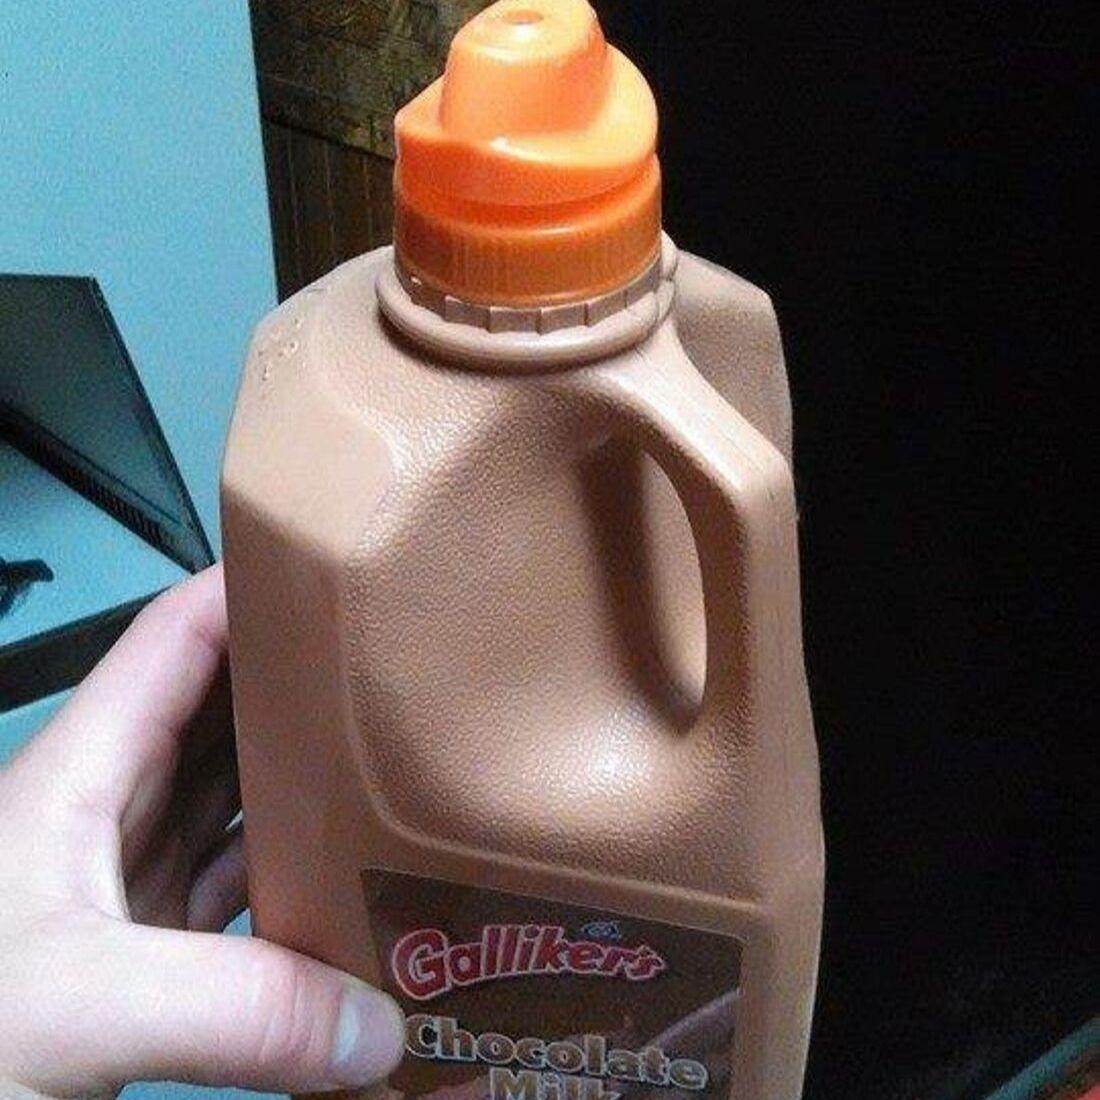 chocolate milk hack with gatorade lid